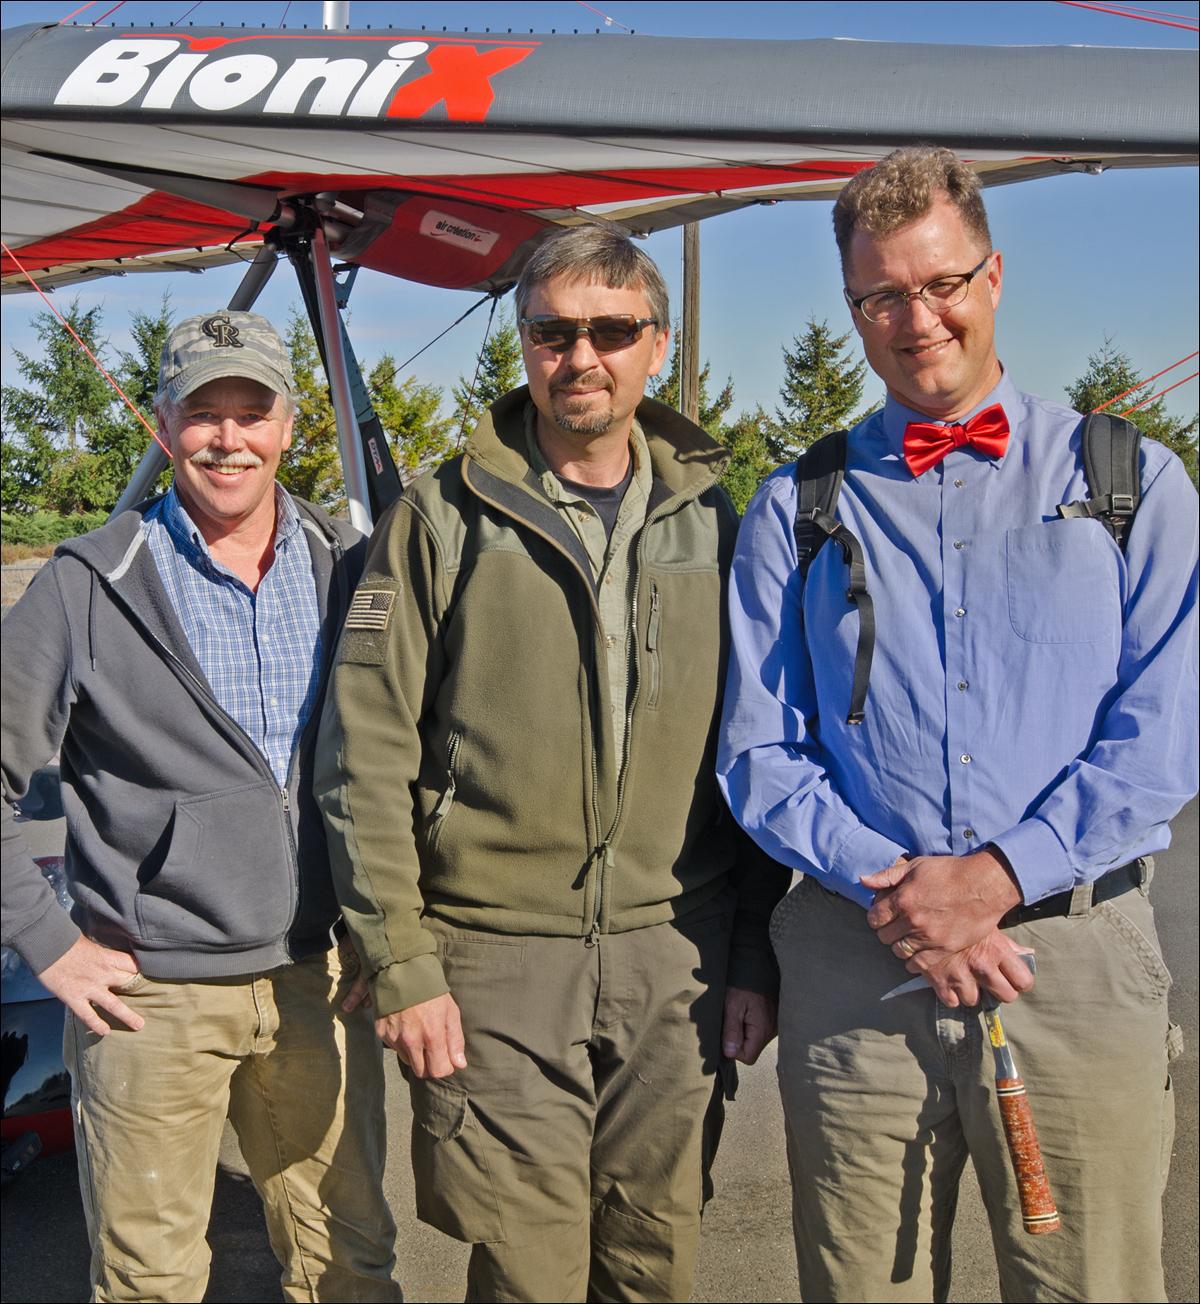 Tom Foster, Tom Tabbert and Nick Zentner.